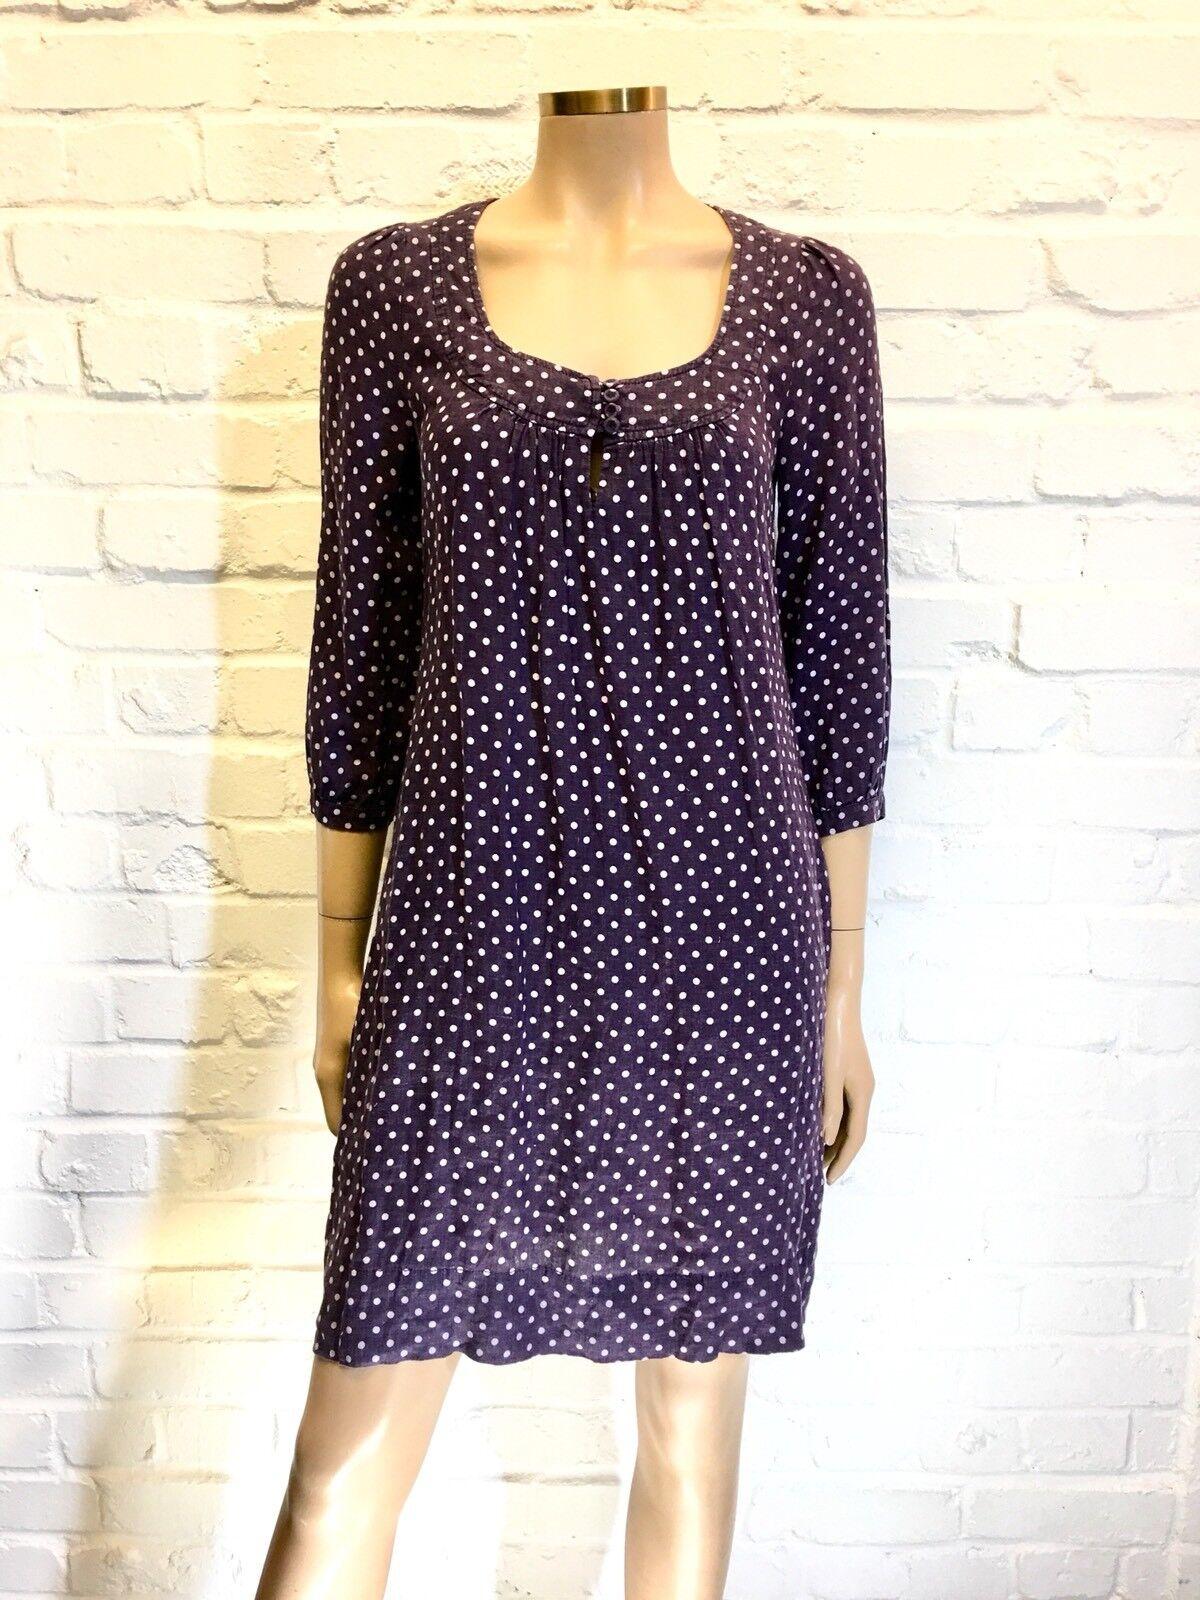 Whistles 100% Cotton Linen Lavender Polkadot Dress